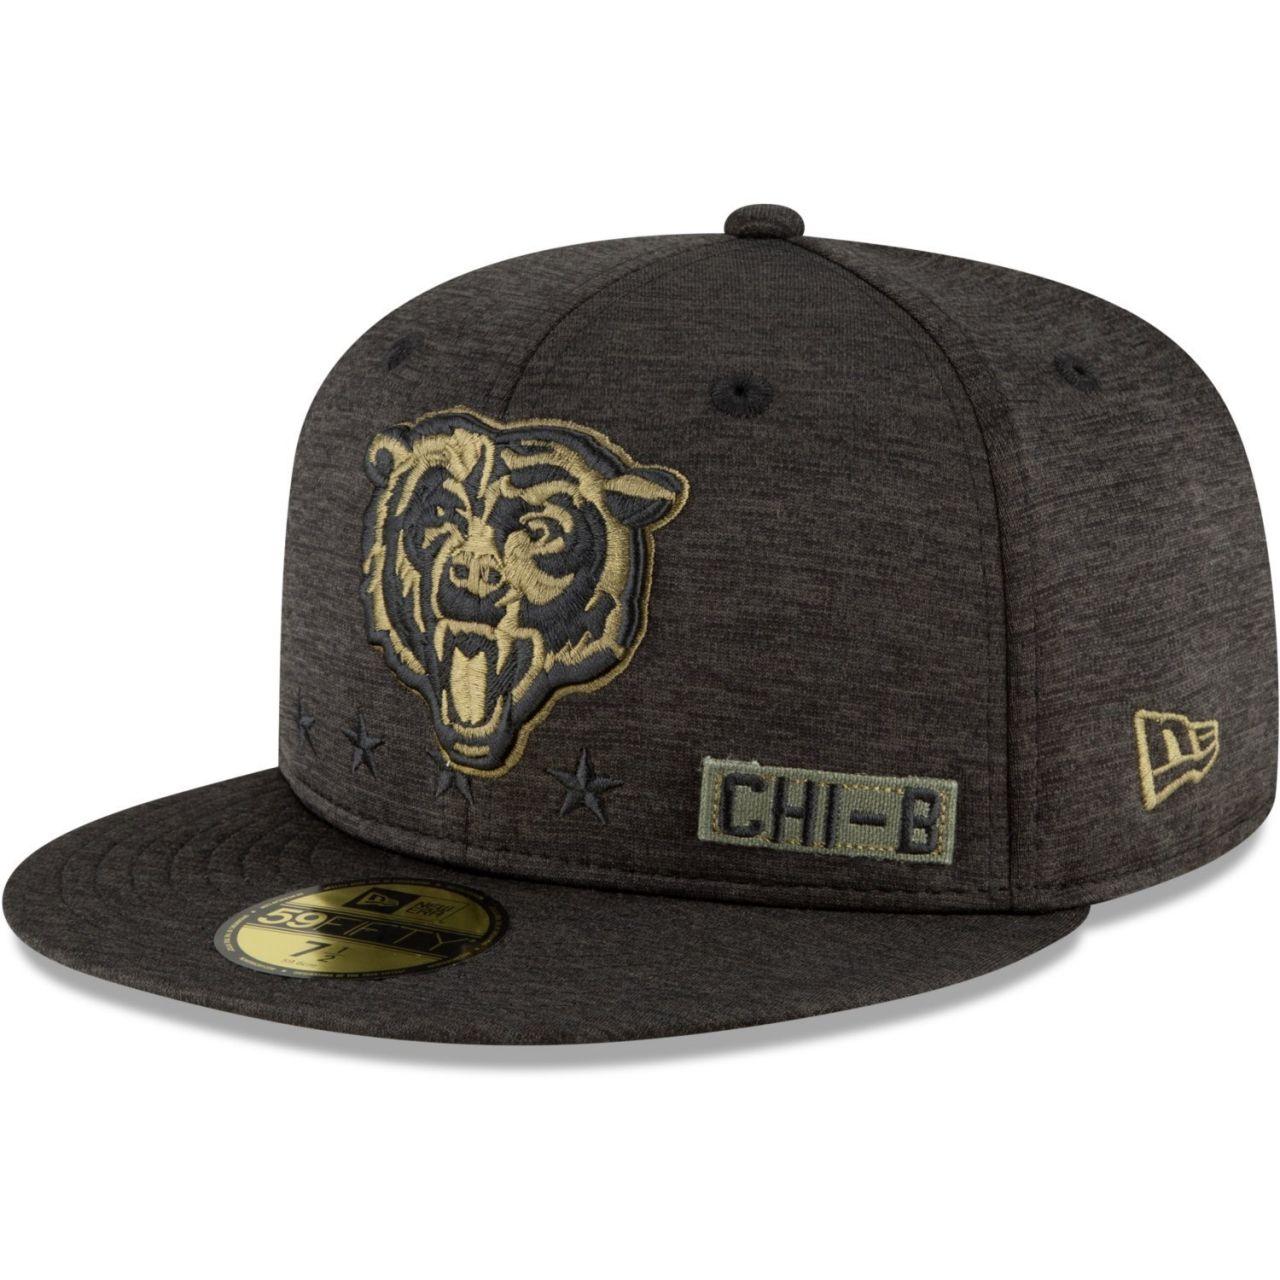 amfoo - New Era 59FIFTY Cap Salute to Service Chicago Bears